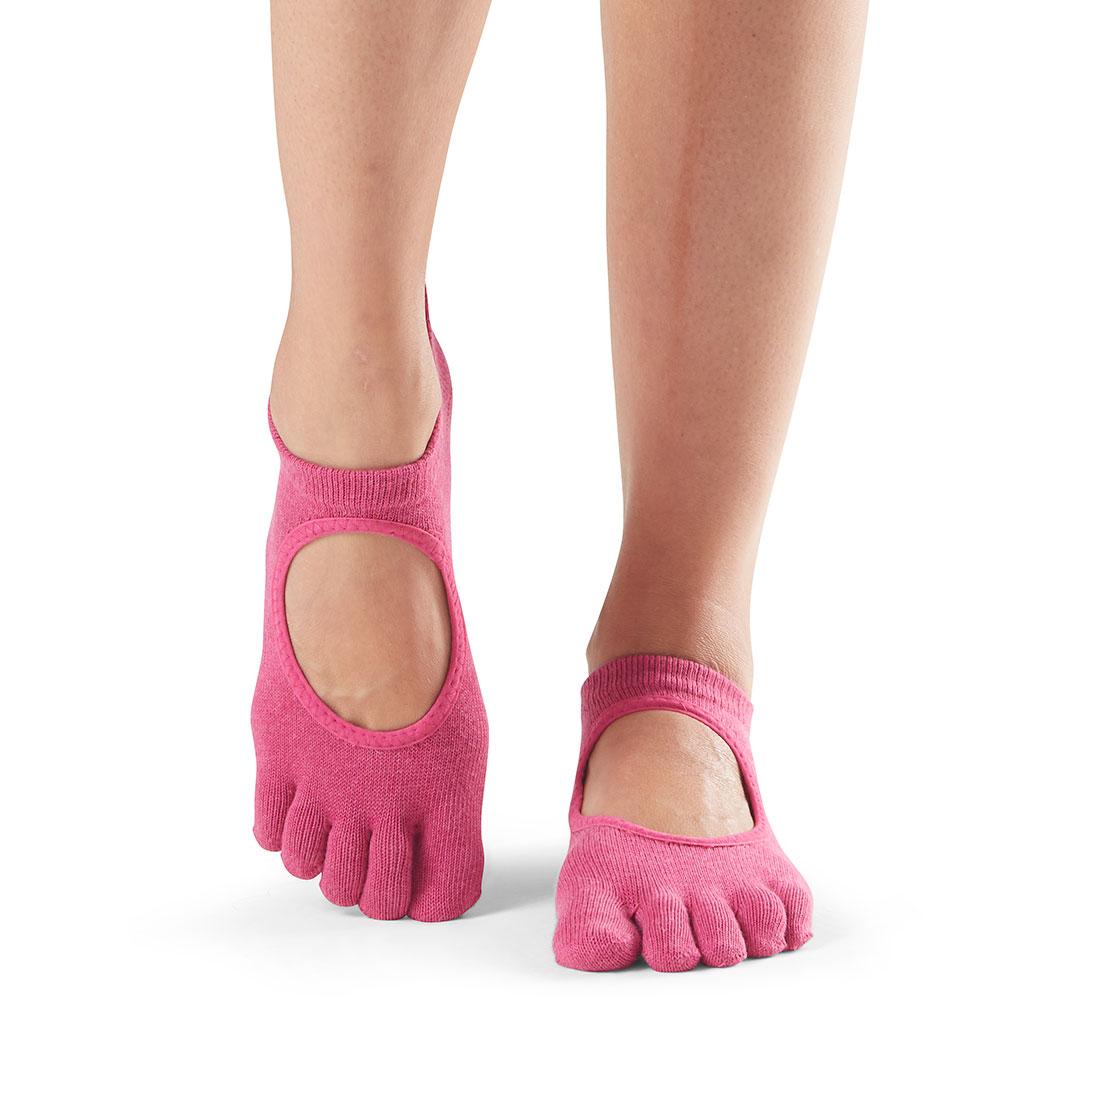 Yogasocken ToeSox Bellarina Full Toe Raspberry - 1